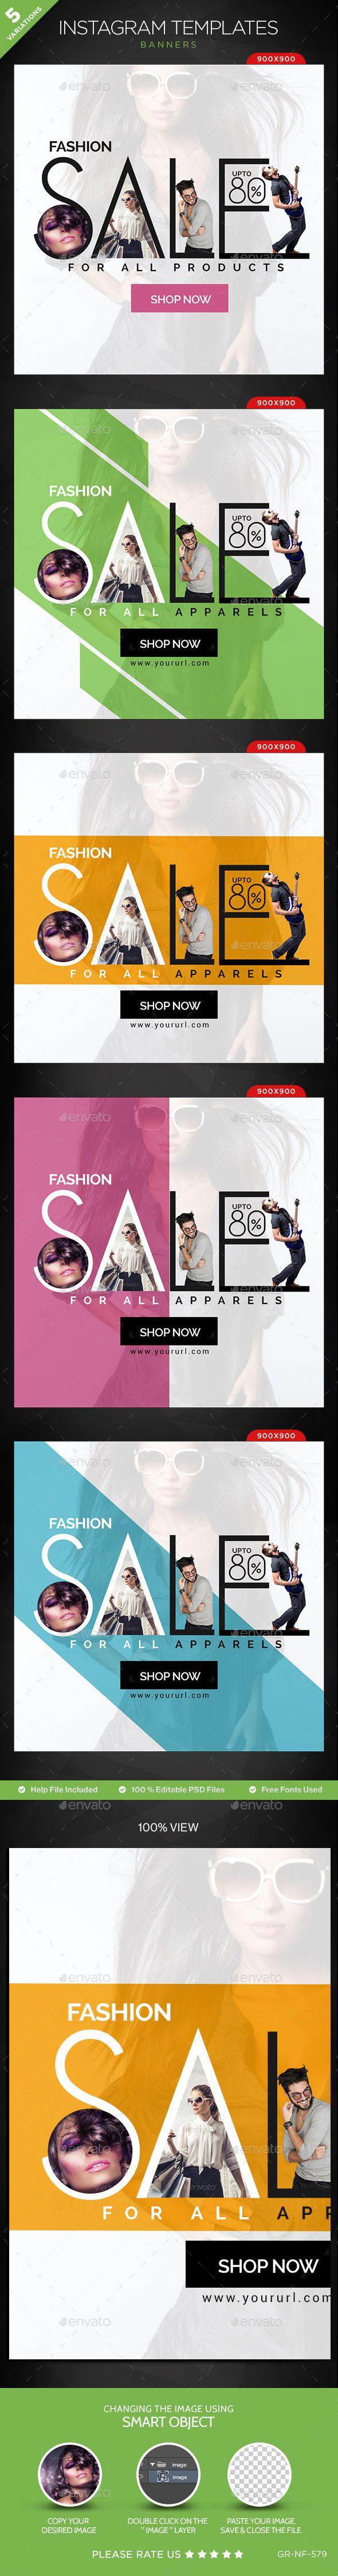 Sales Instagram Templates - 5 Designs